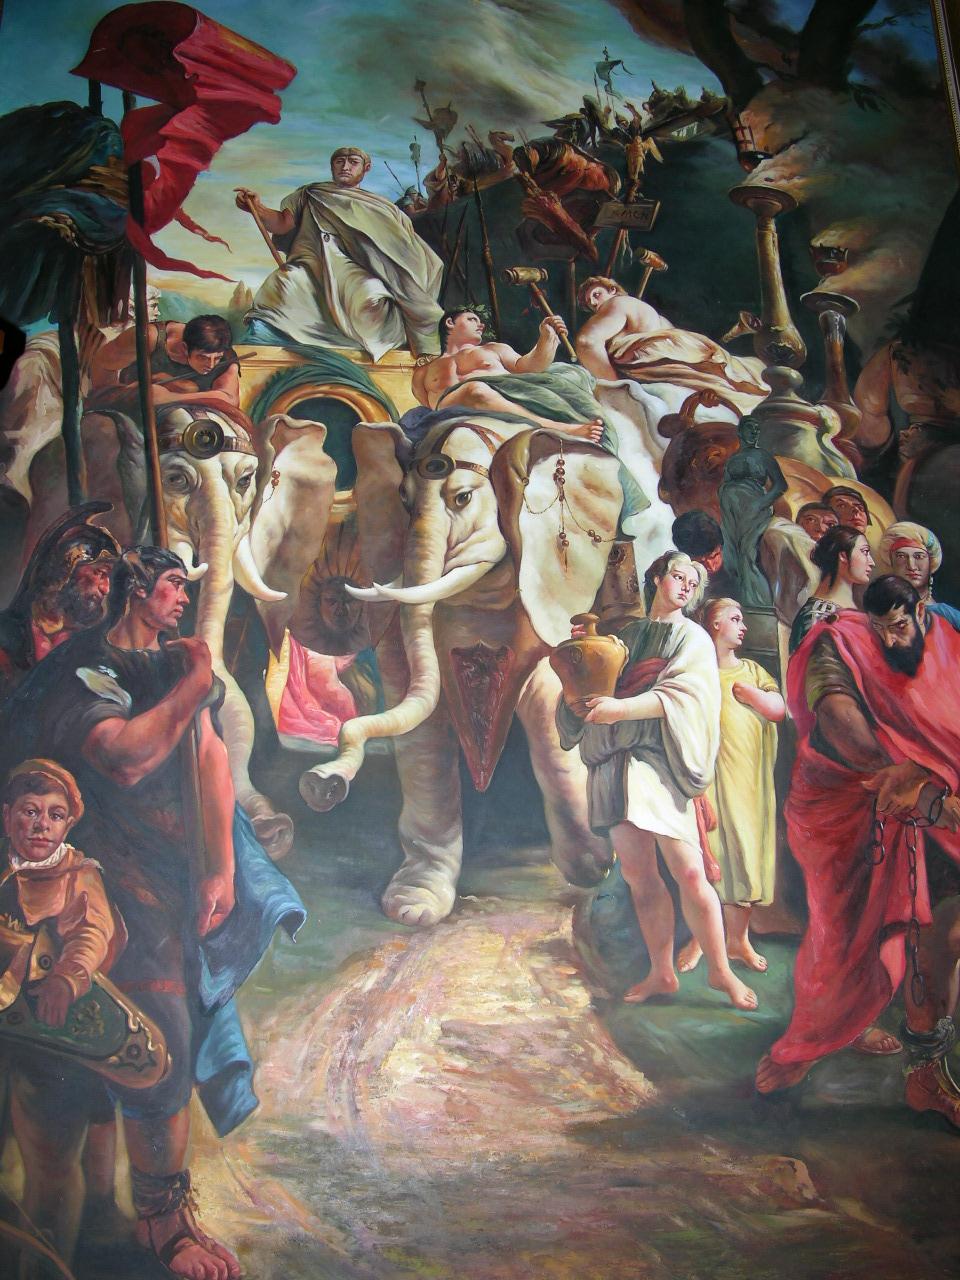 A Monumental Painting Of Hannibal Barca Circa 247 183 Bc